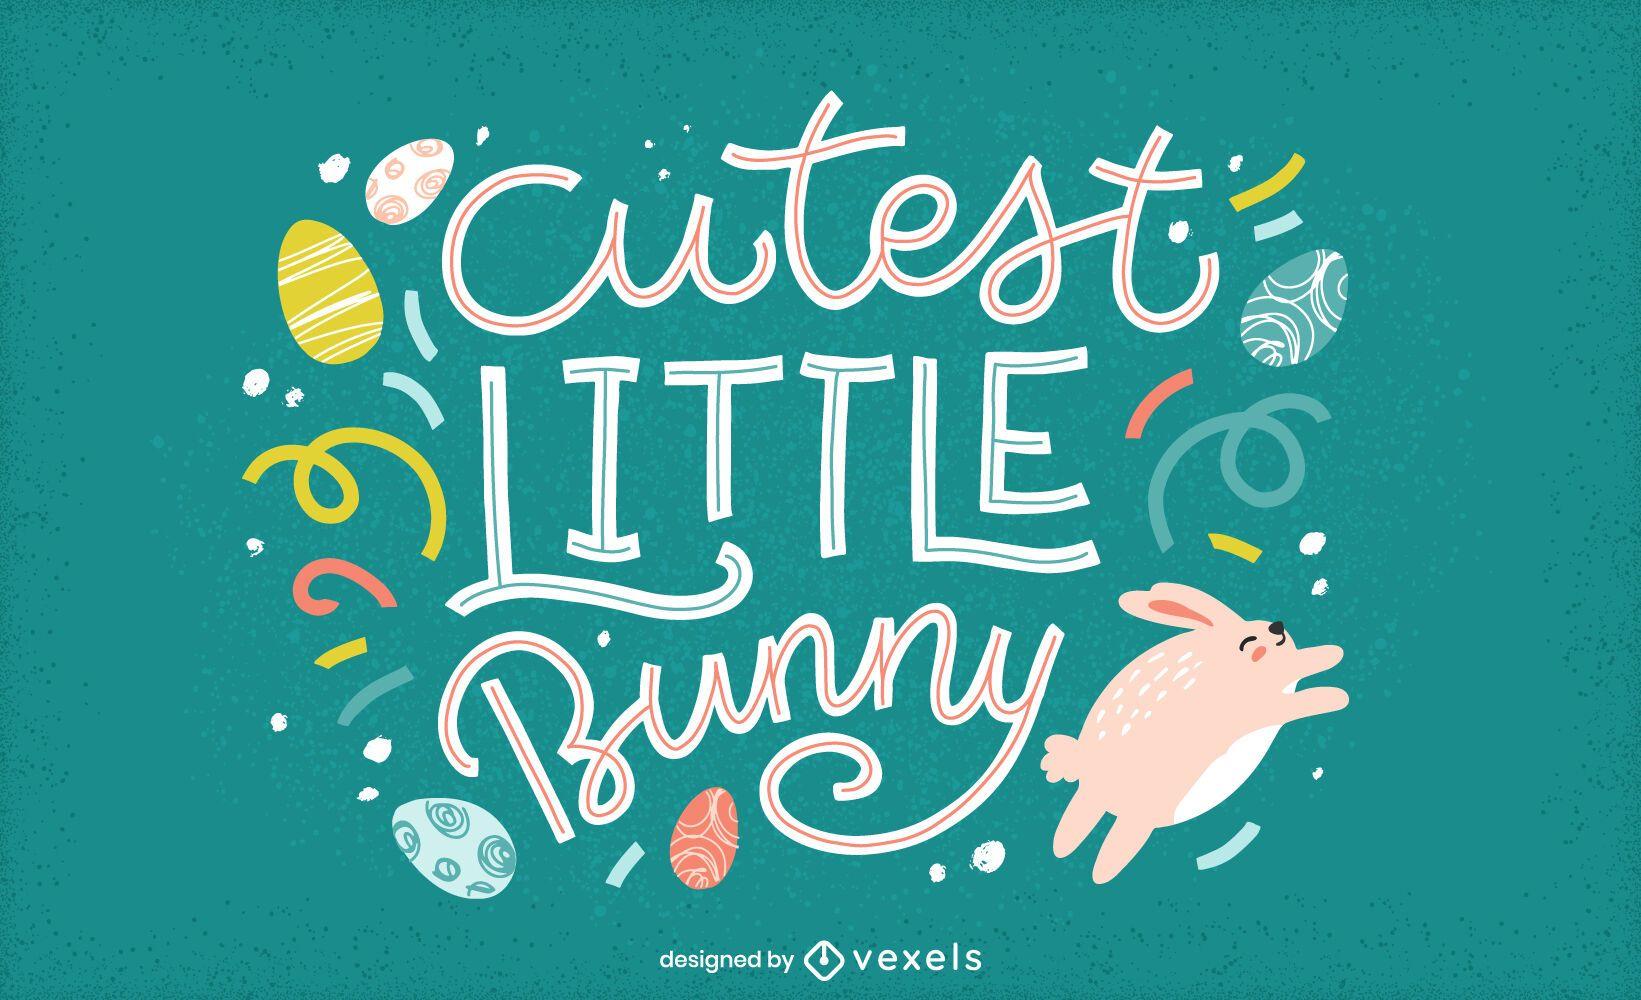 Cutest little bunny lettering design